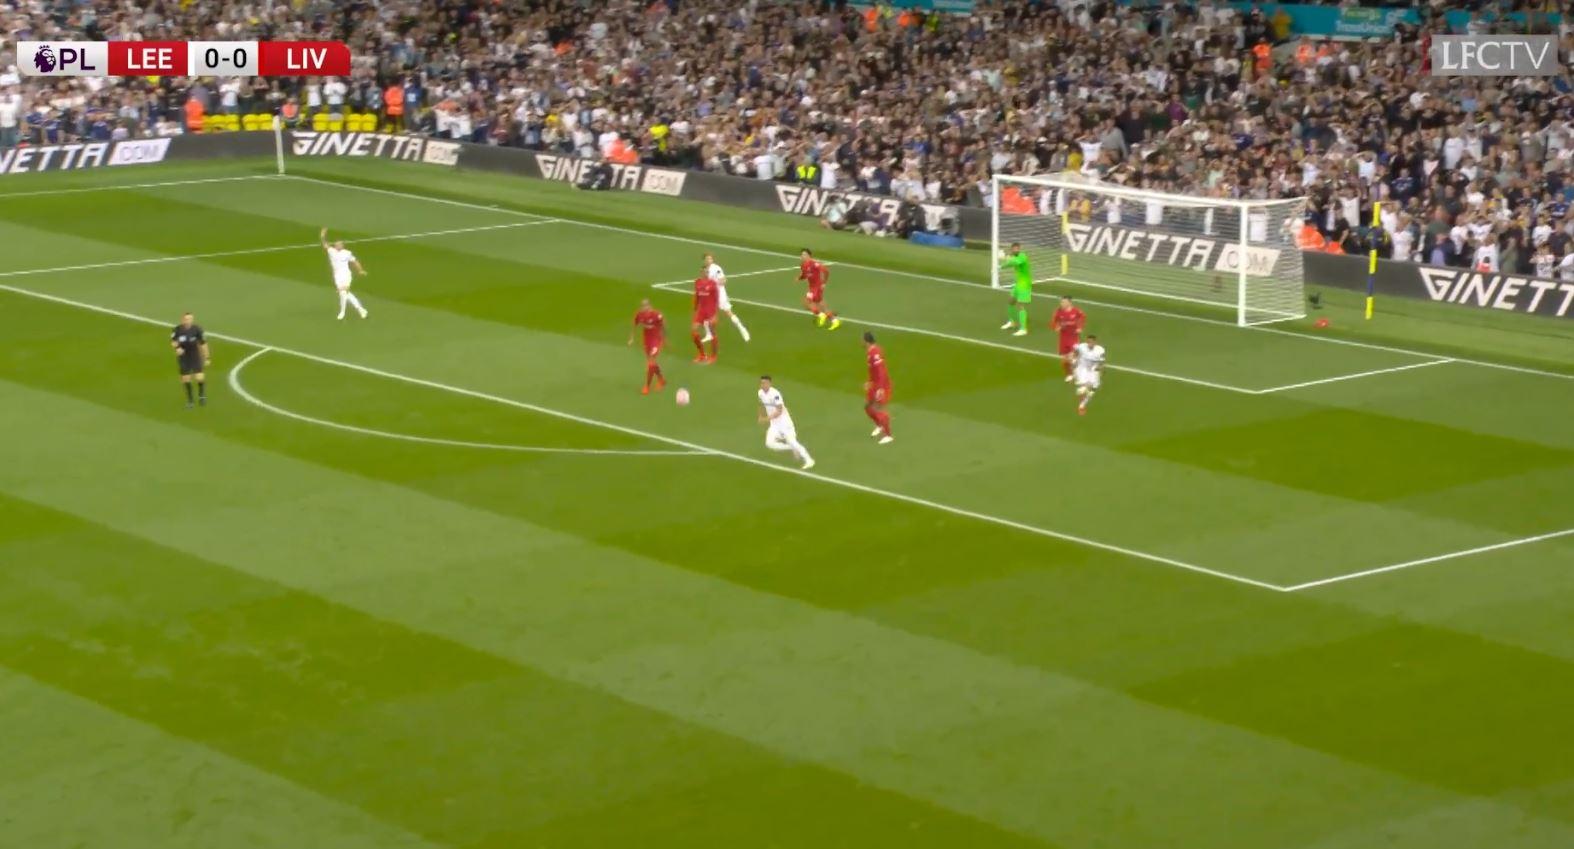 Watch Full Highlight Leeds United 0-3 Liverpool 2021.09.12 (16h30)